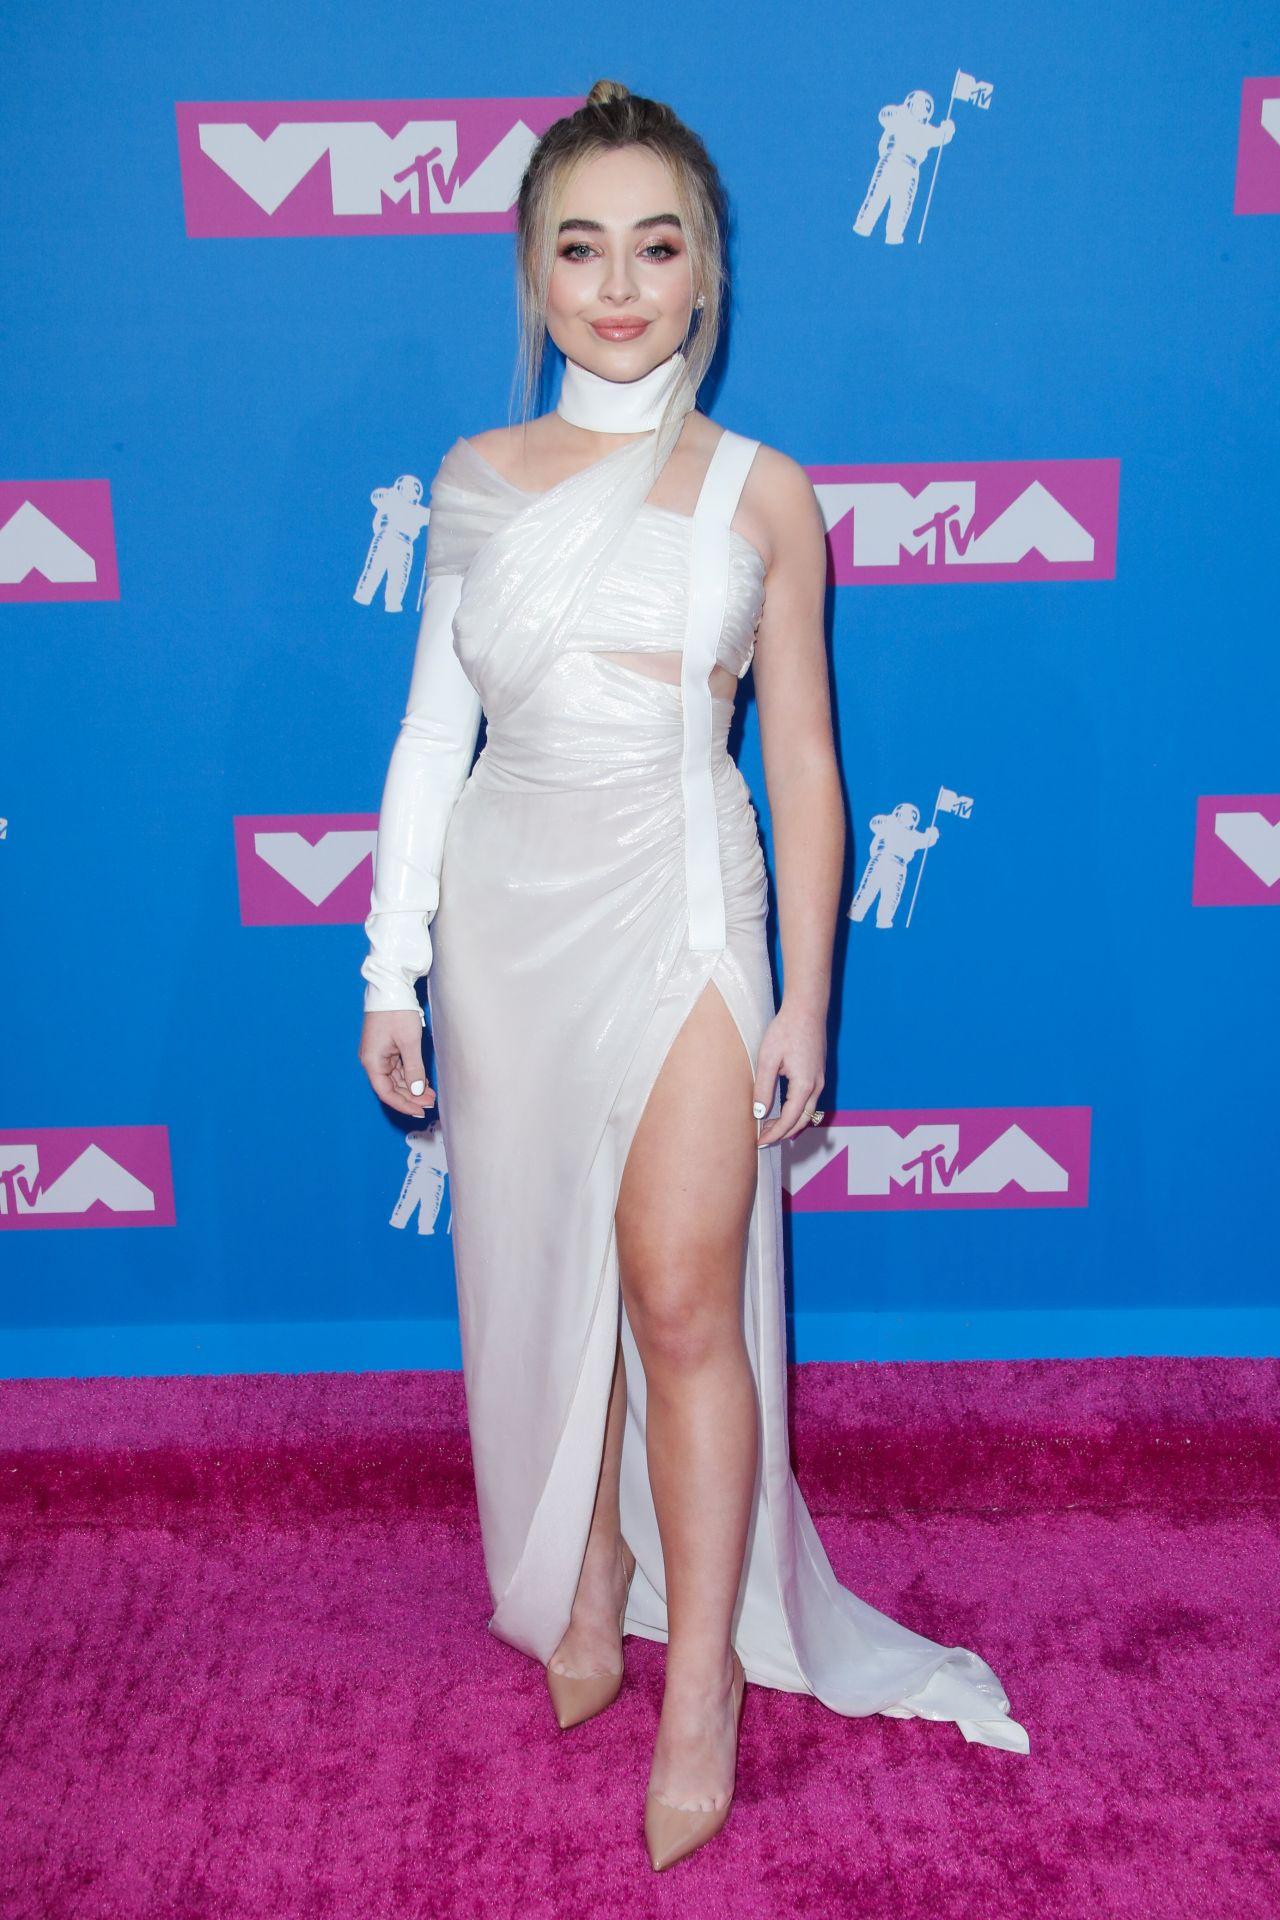 MTV Video Music Awards Tour Dates 2019, MTV Video Music ...